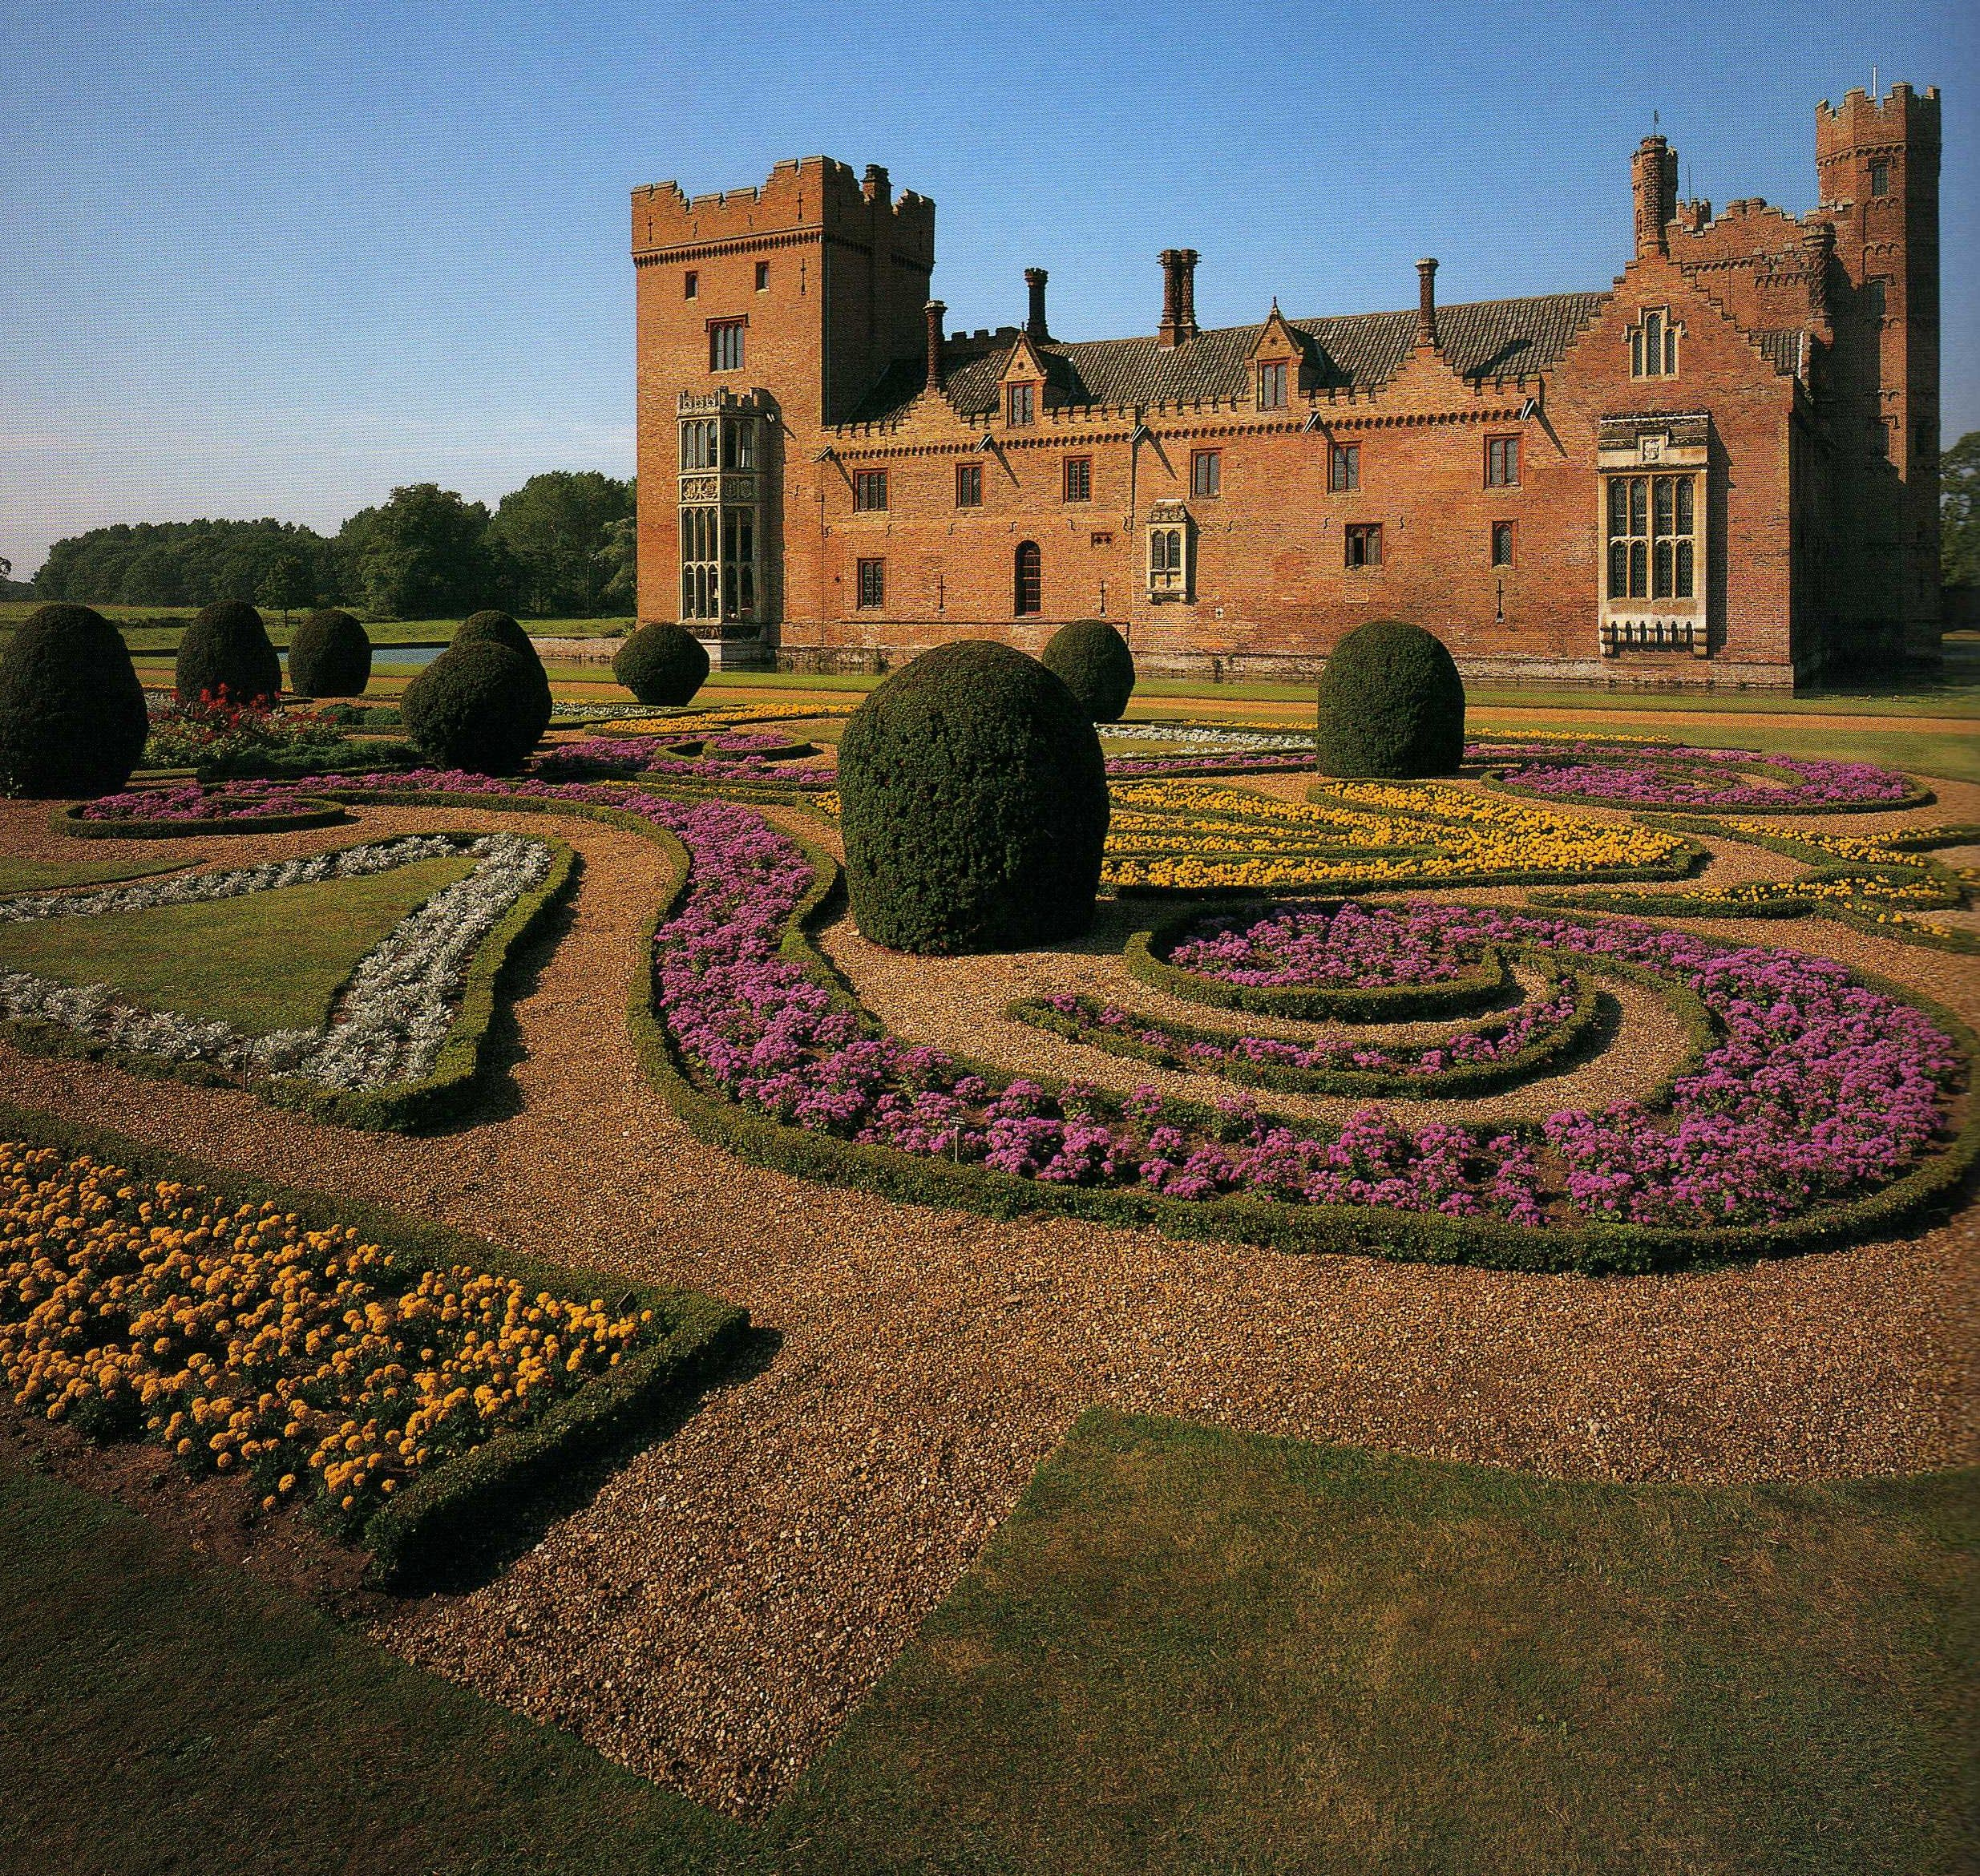 Oxburgh Hall - Oxborough - Kings Lynn, Norfolk